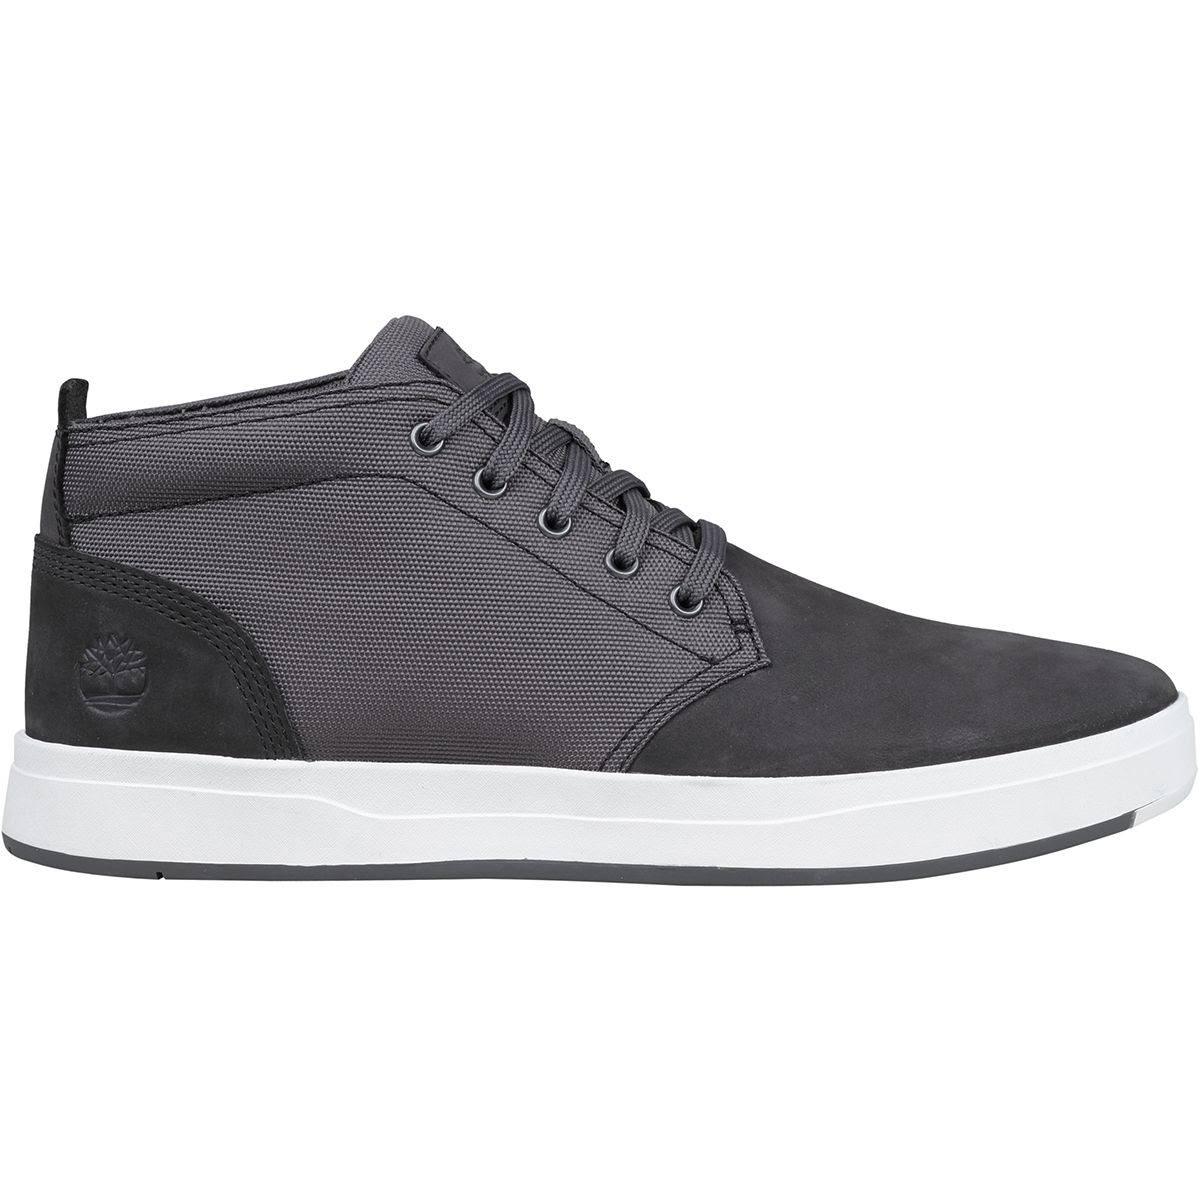 Davis 12 Gris Hombres Square para Oscuro Tb0a1t1hc64 Shoes Chukka Timberland z7dwOqgz